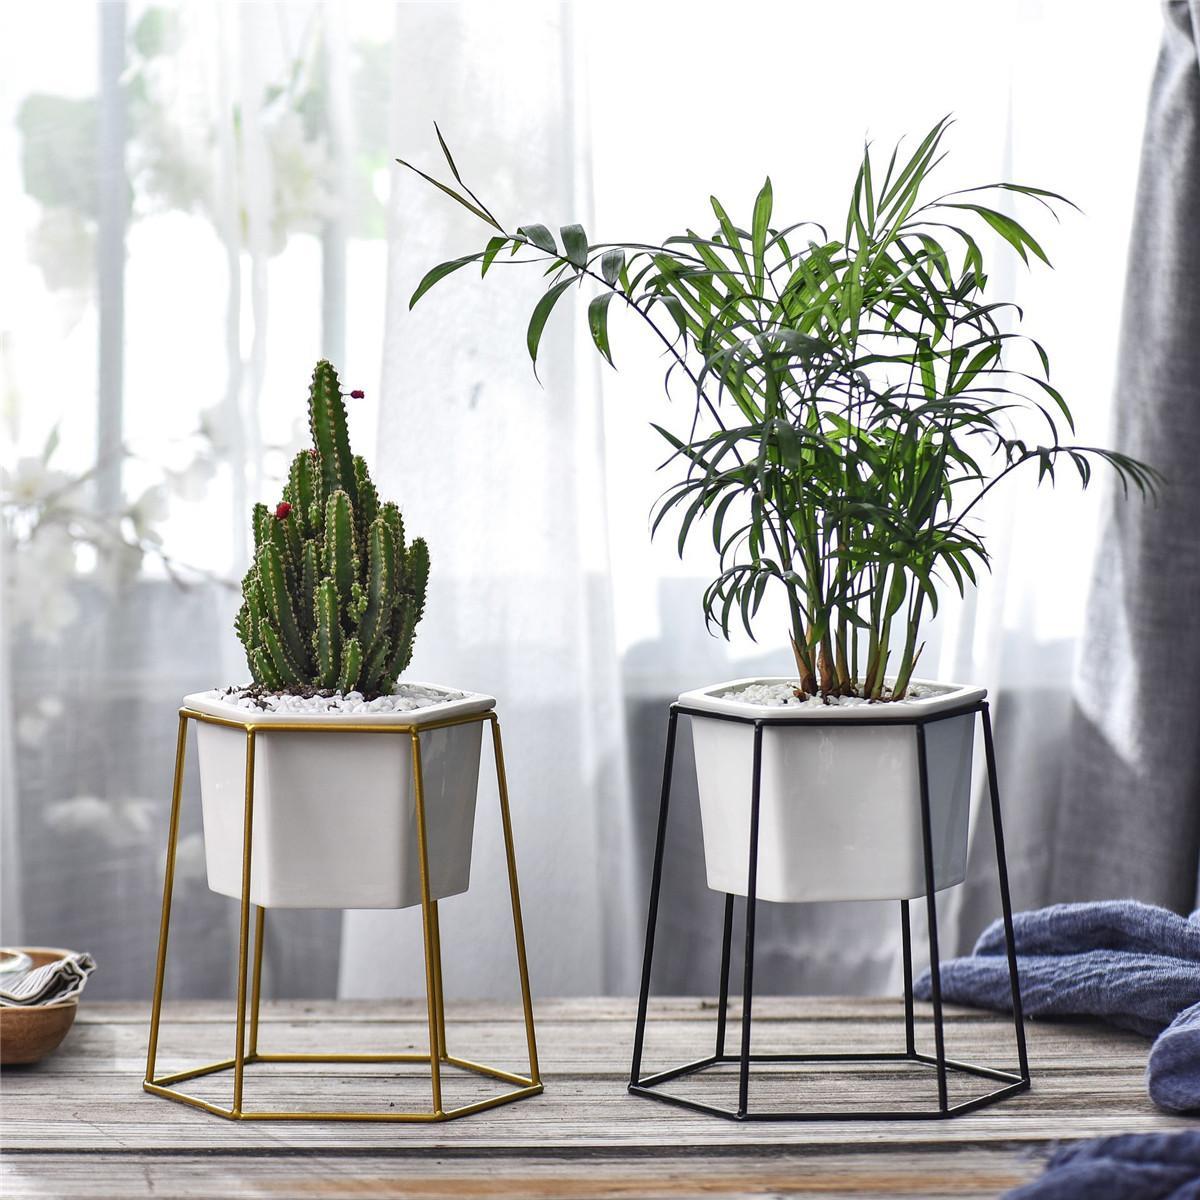 Hexagon Tools Diy Ceramic Plant Pot Metal Rack Holder Set Succulent Flower Planter Garden Buy Sell Online Best Prices In Srilanka Daraz Lk